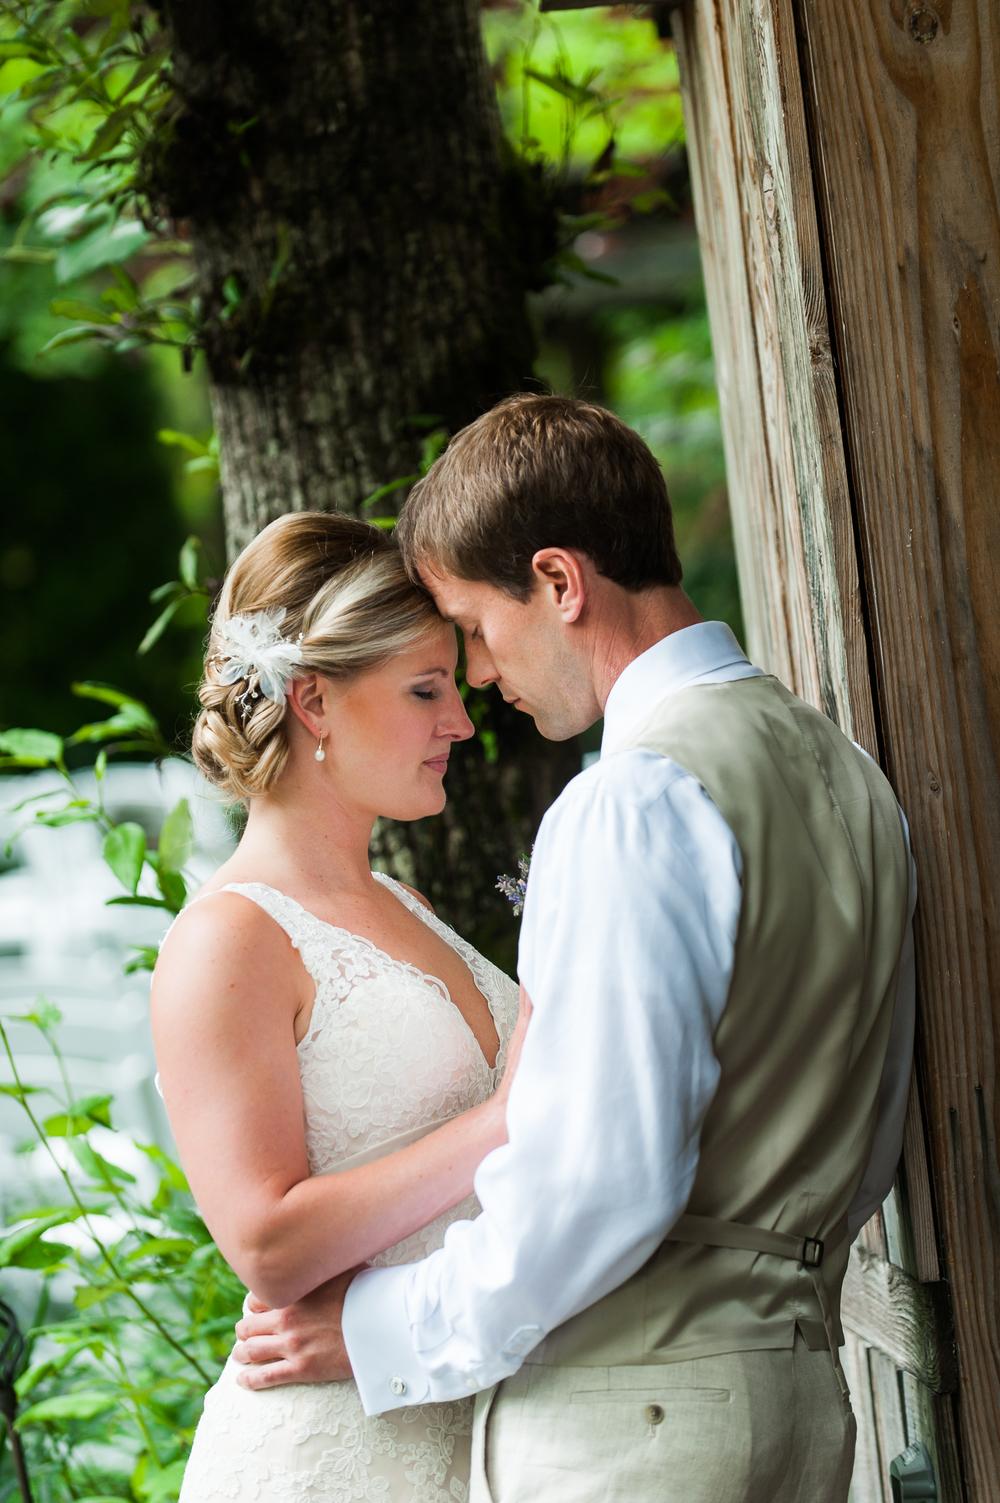 JJ-wedding-Van-Wyhe-Photography-203.jpg